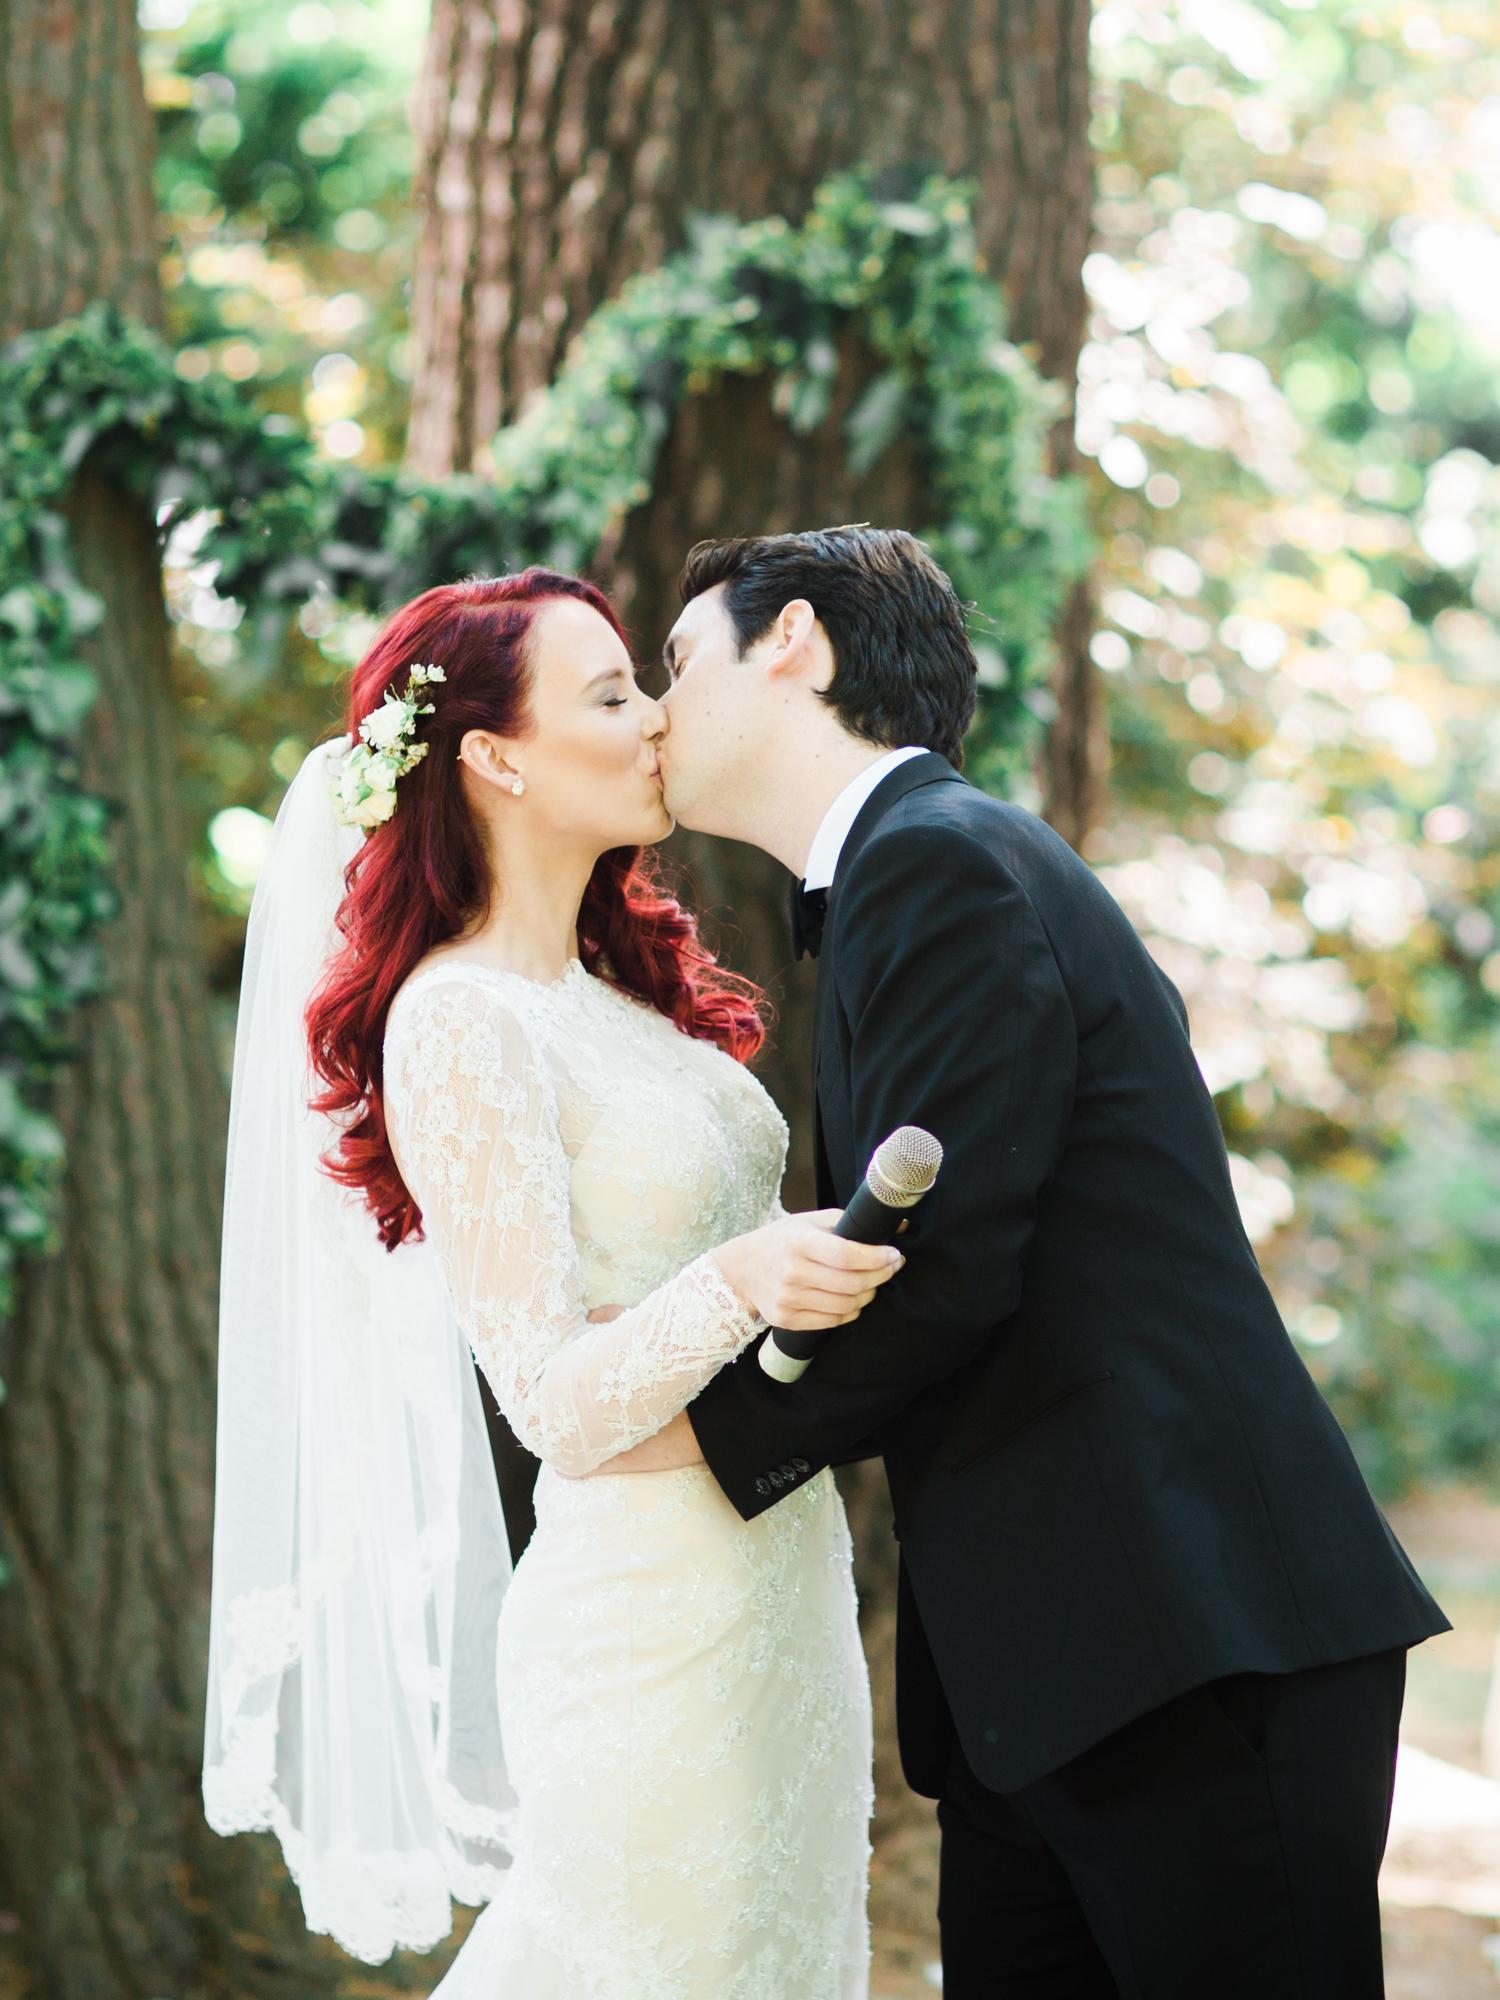 Top-Niagara-Wedding-Photographer-50-15.jpg